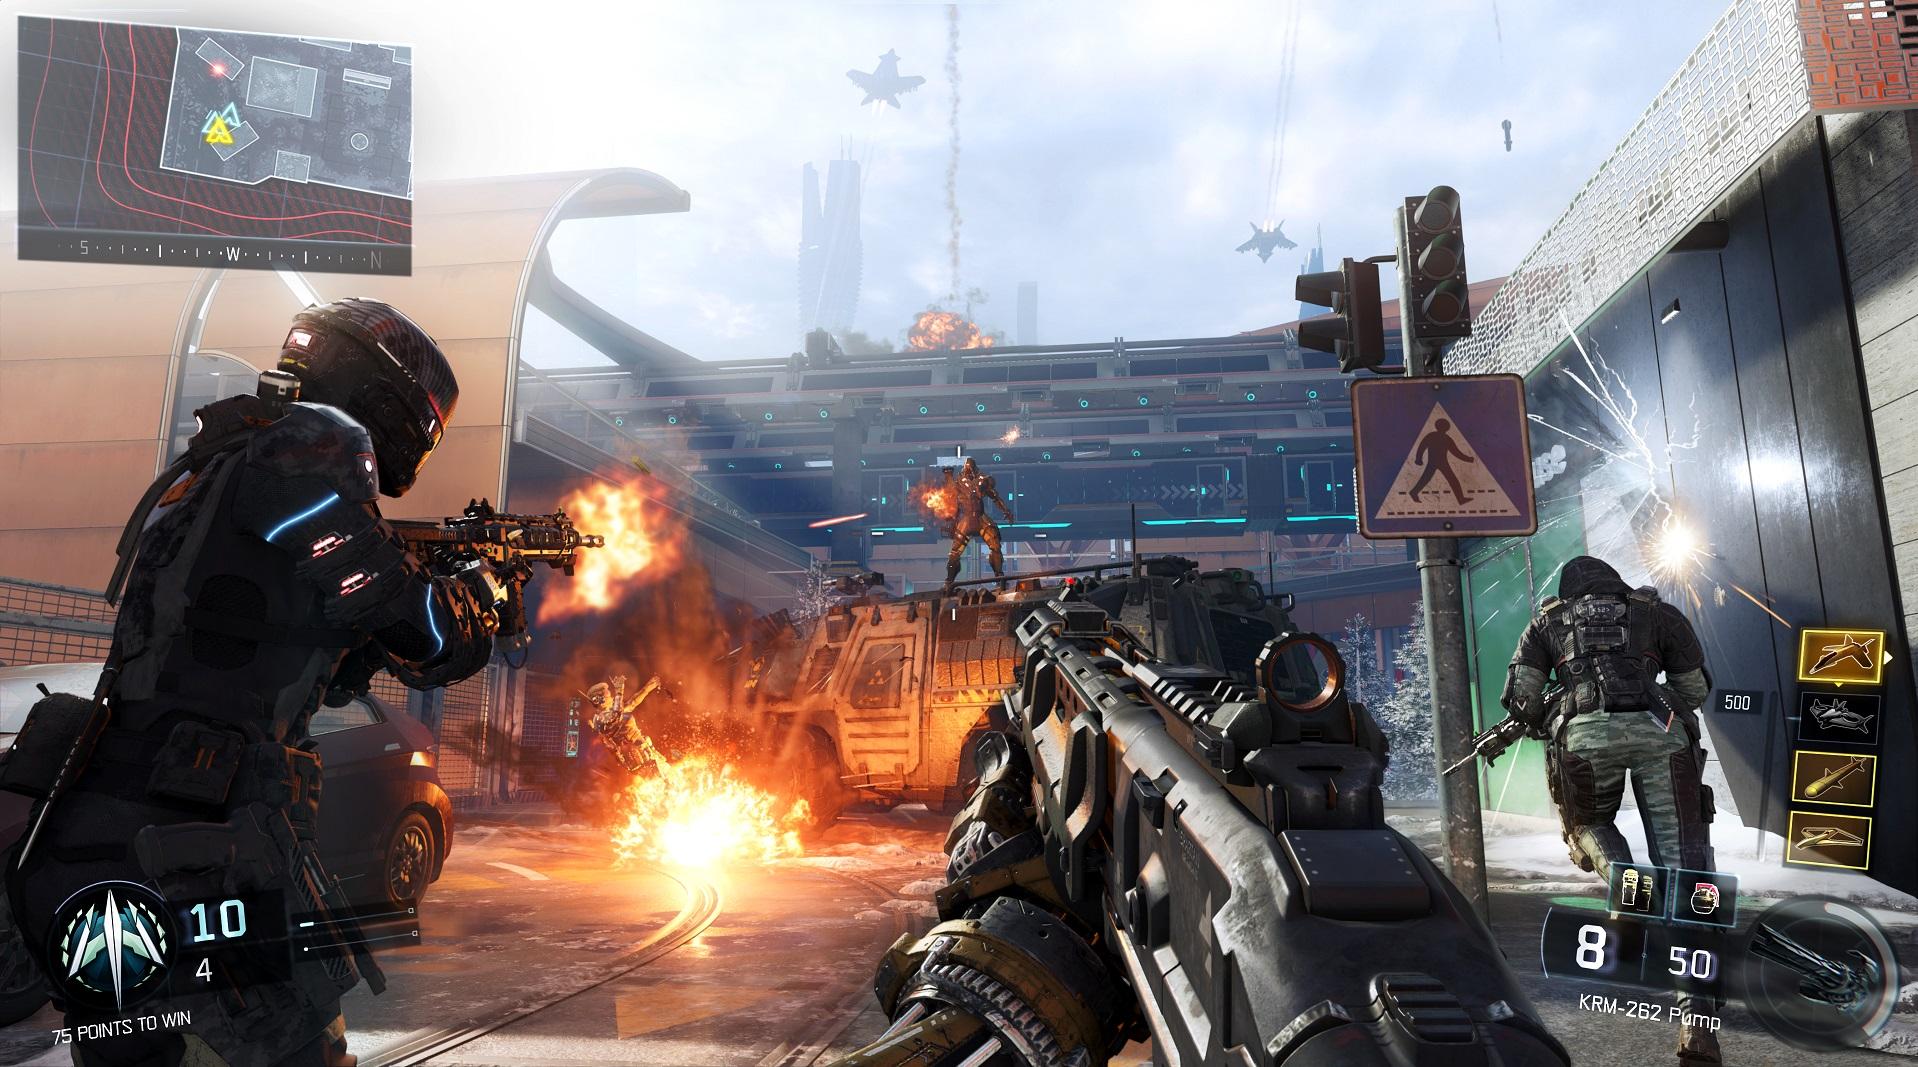 En oppfølger til Black Ops 3 lanseres trolig i høst,